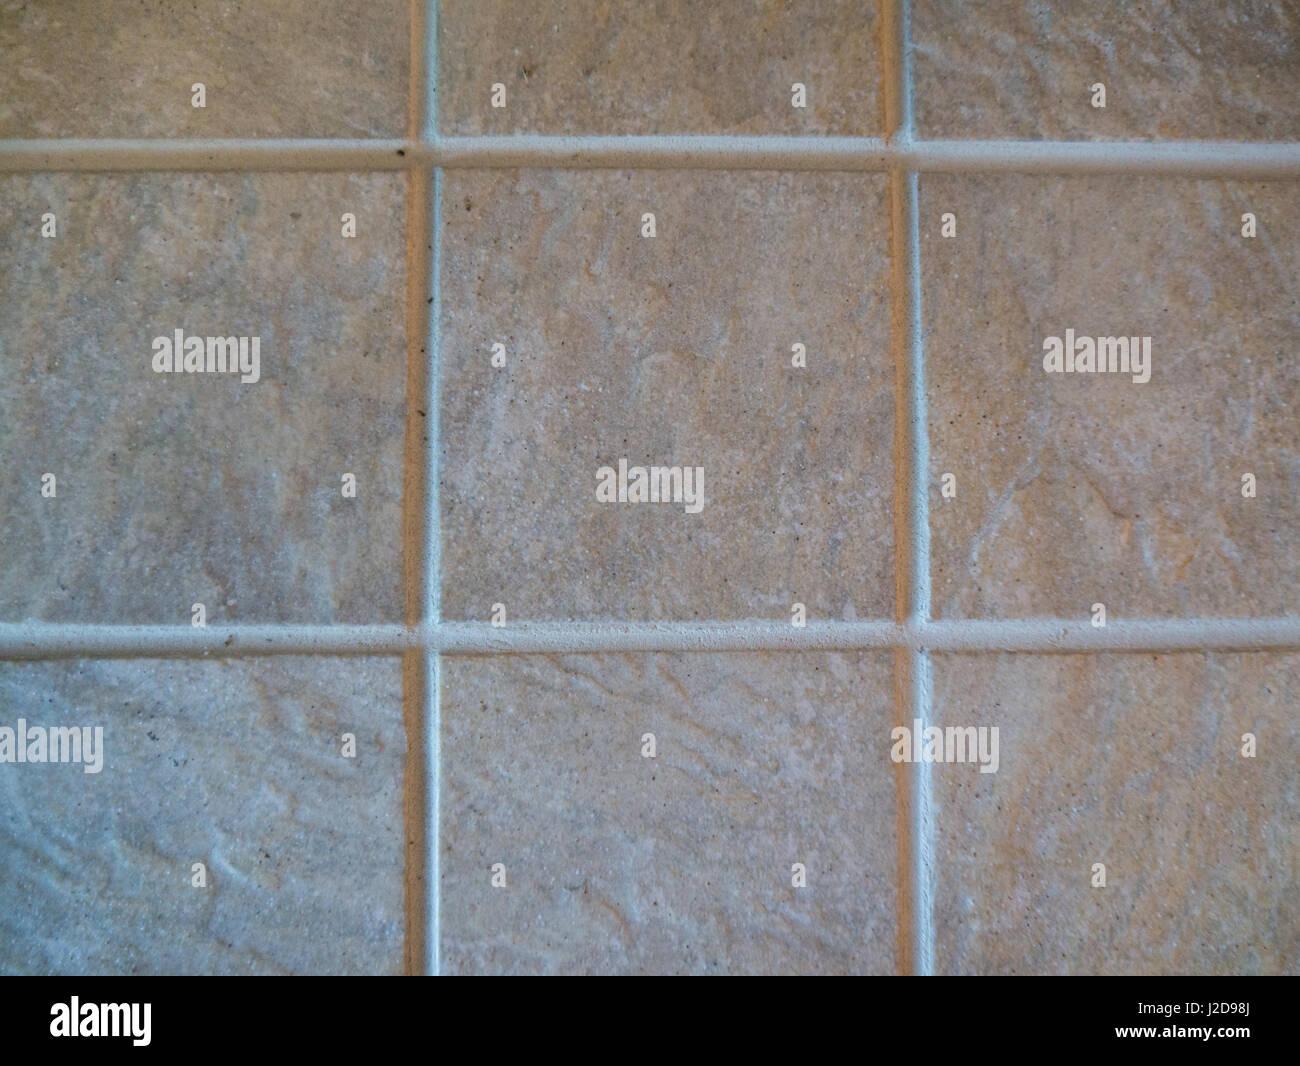 Ceramic tiles and sanded grout lines, landscape orientation - Stock Image